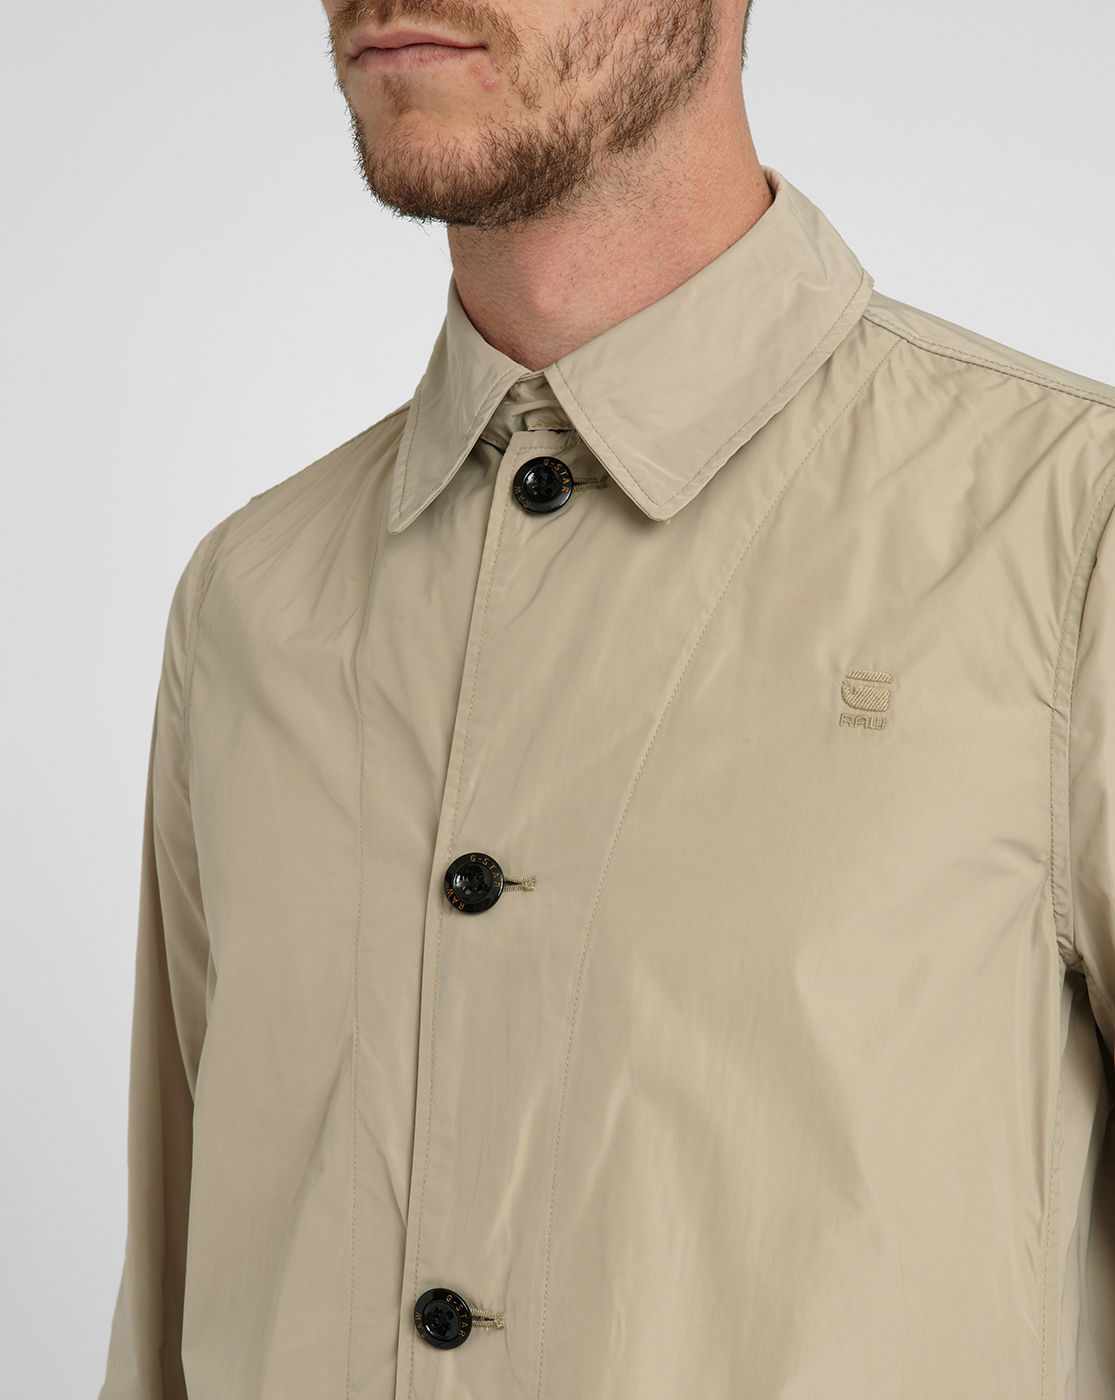 g star raw beige valdo james nylon trench coat in natural for men lyst. Black Bedroom Furniture Sets. Home Design Ideas